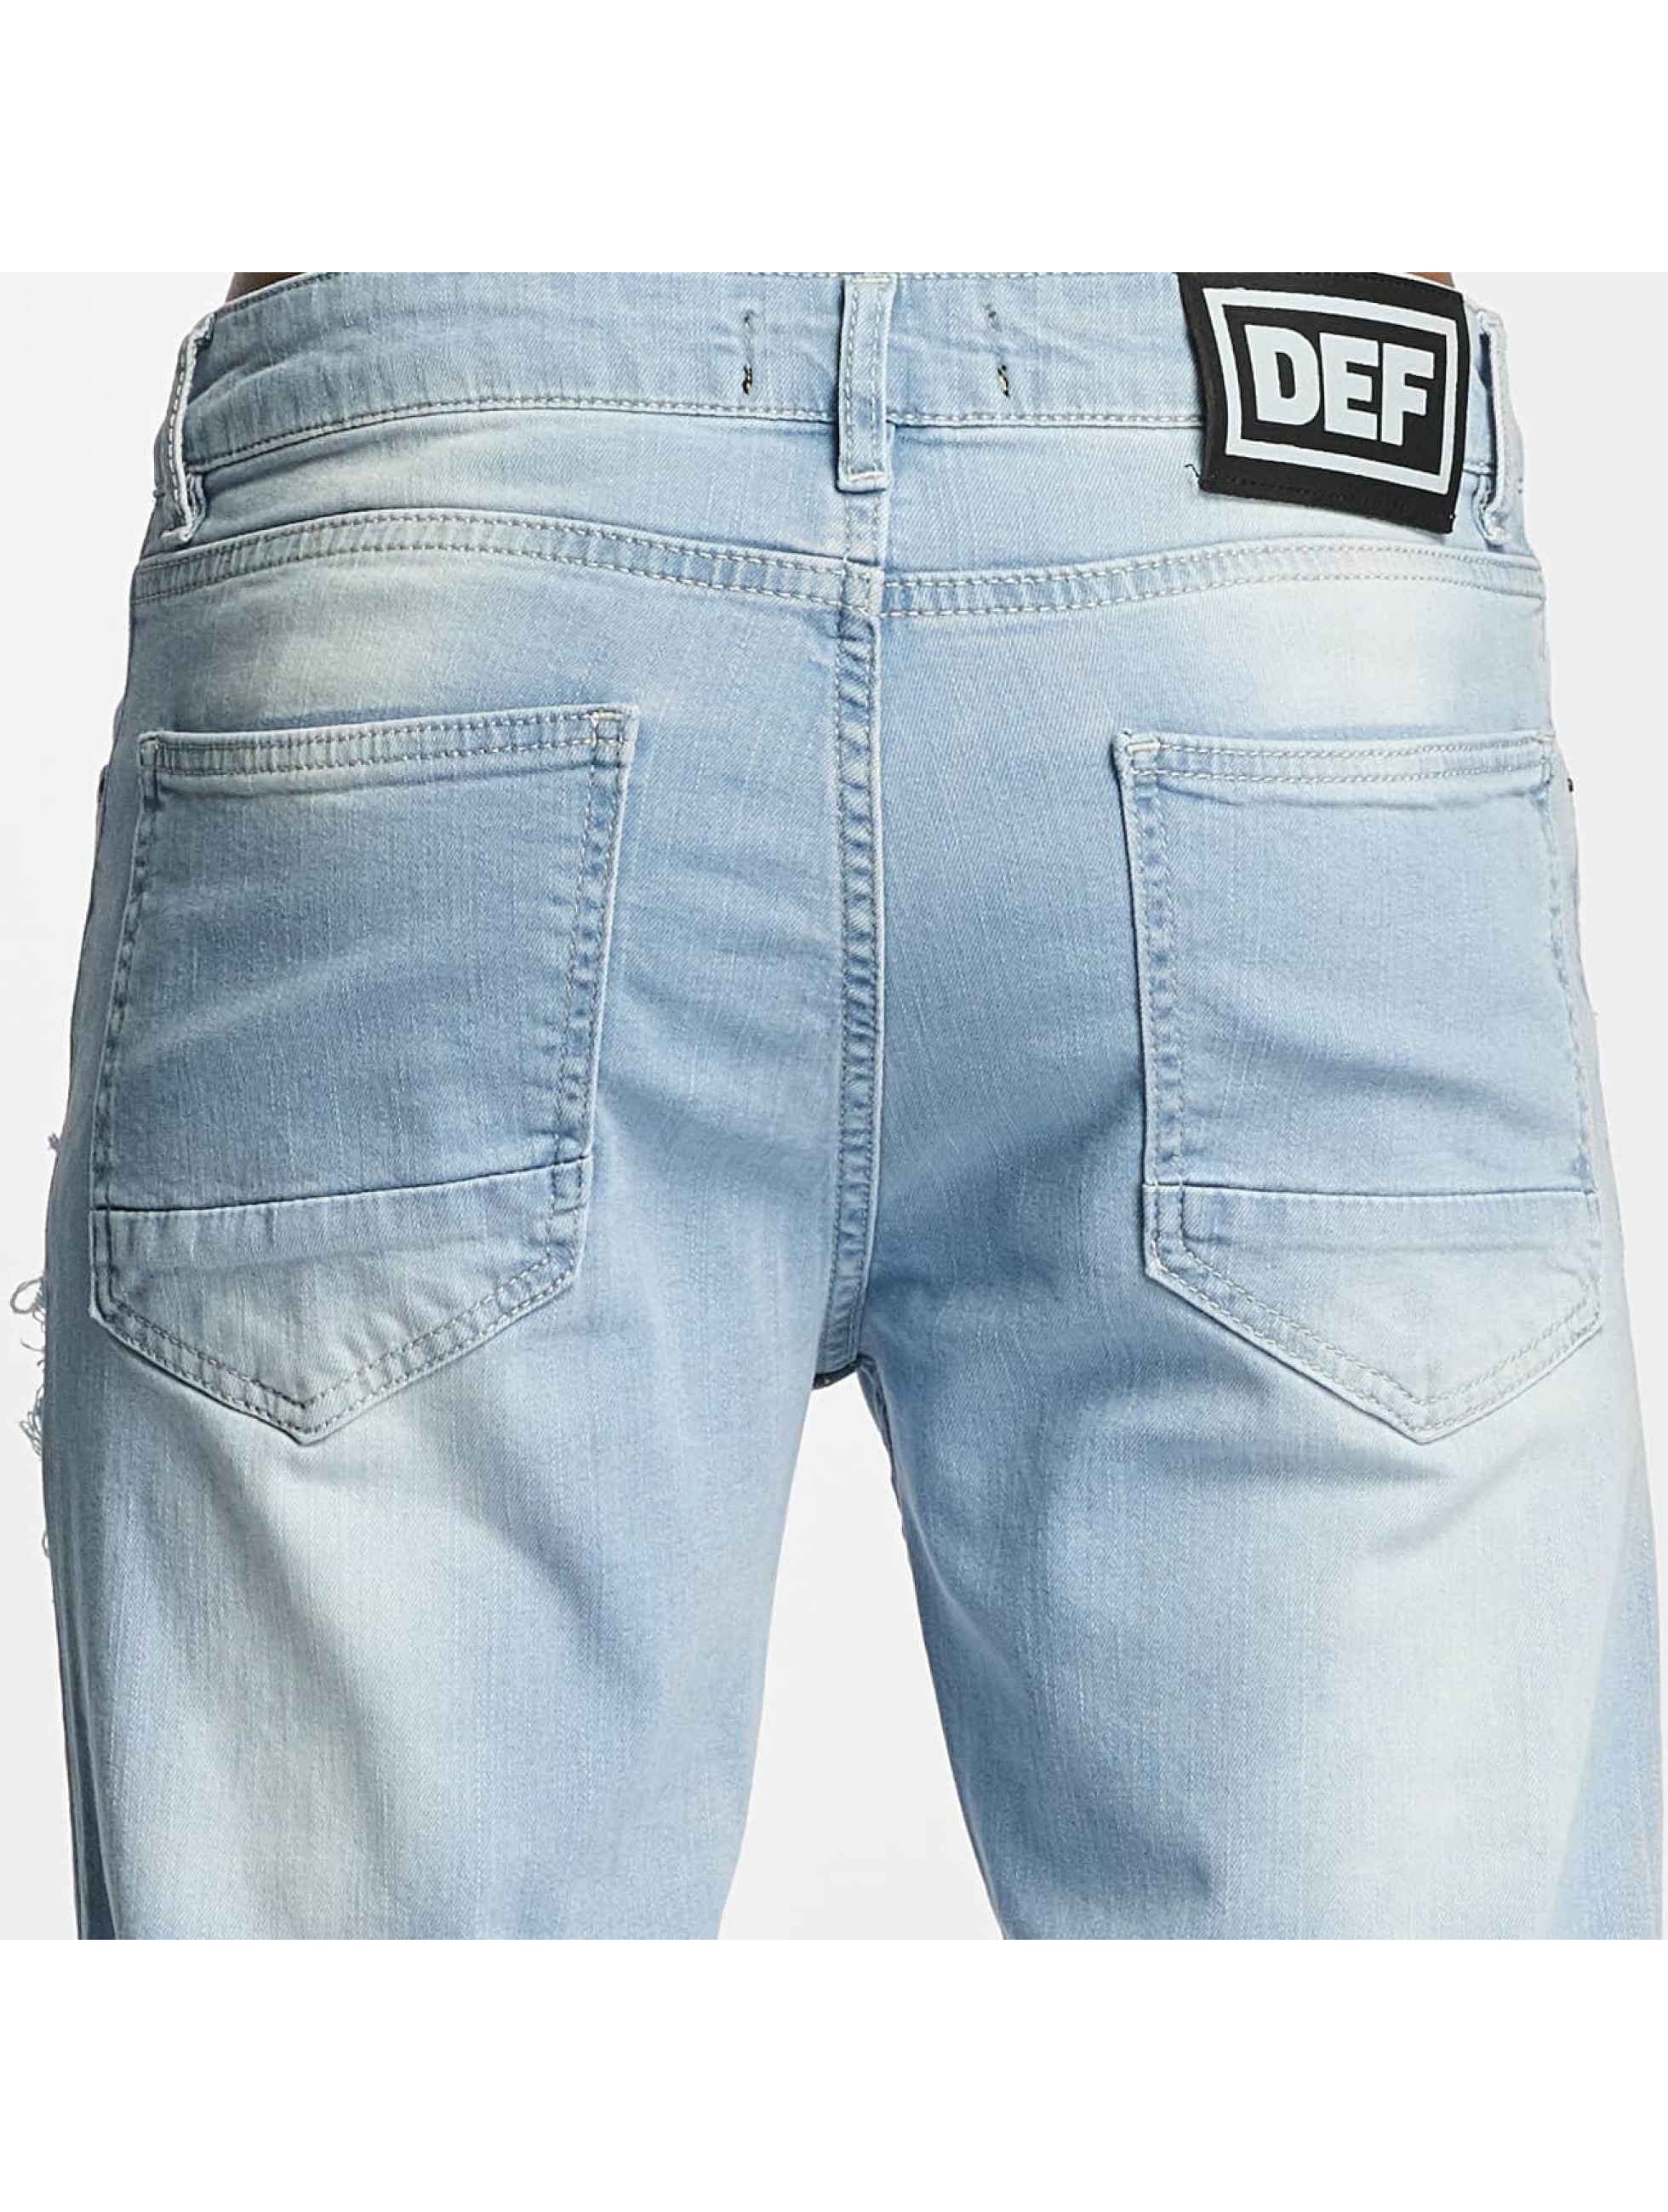 DEF Antifit Used blau